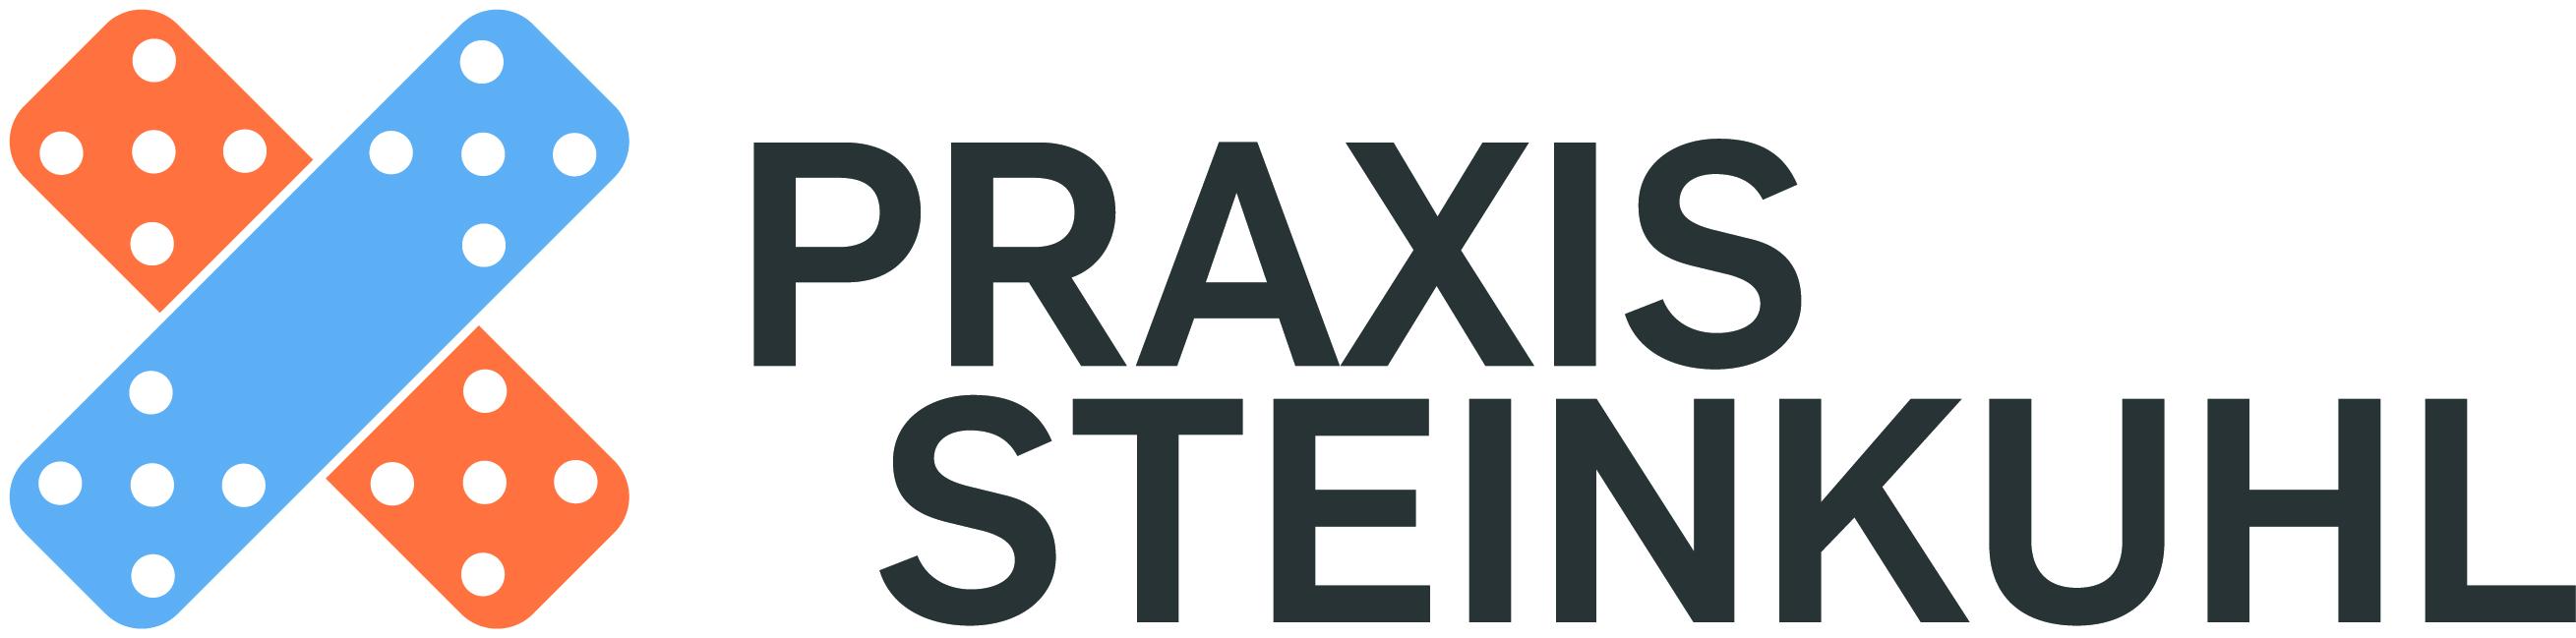 PRAXIS STEINKUHL